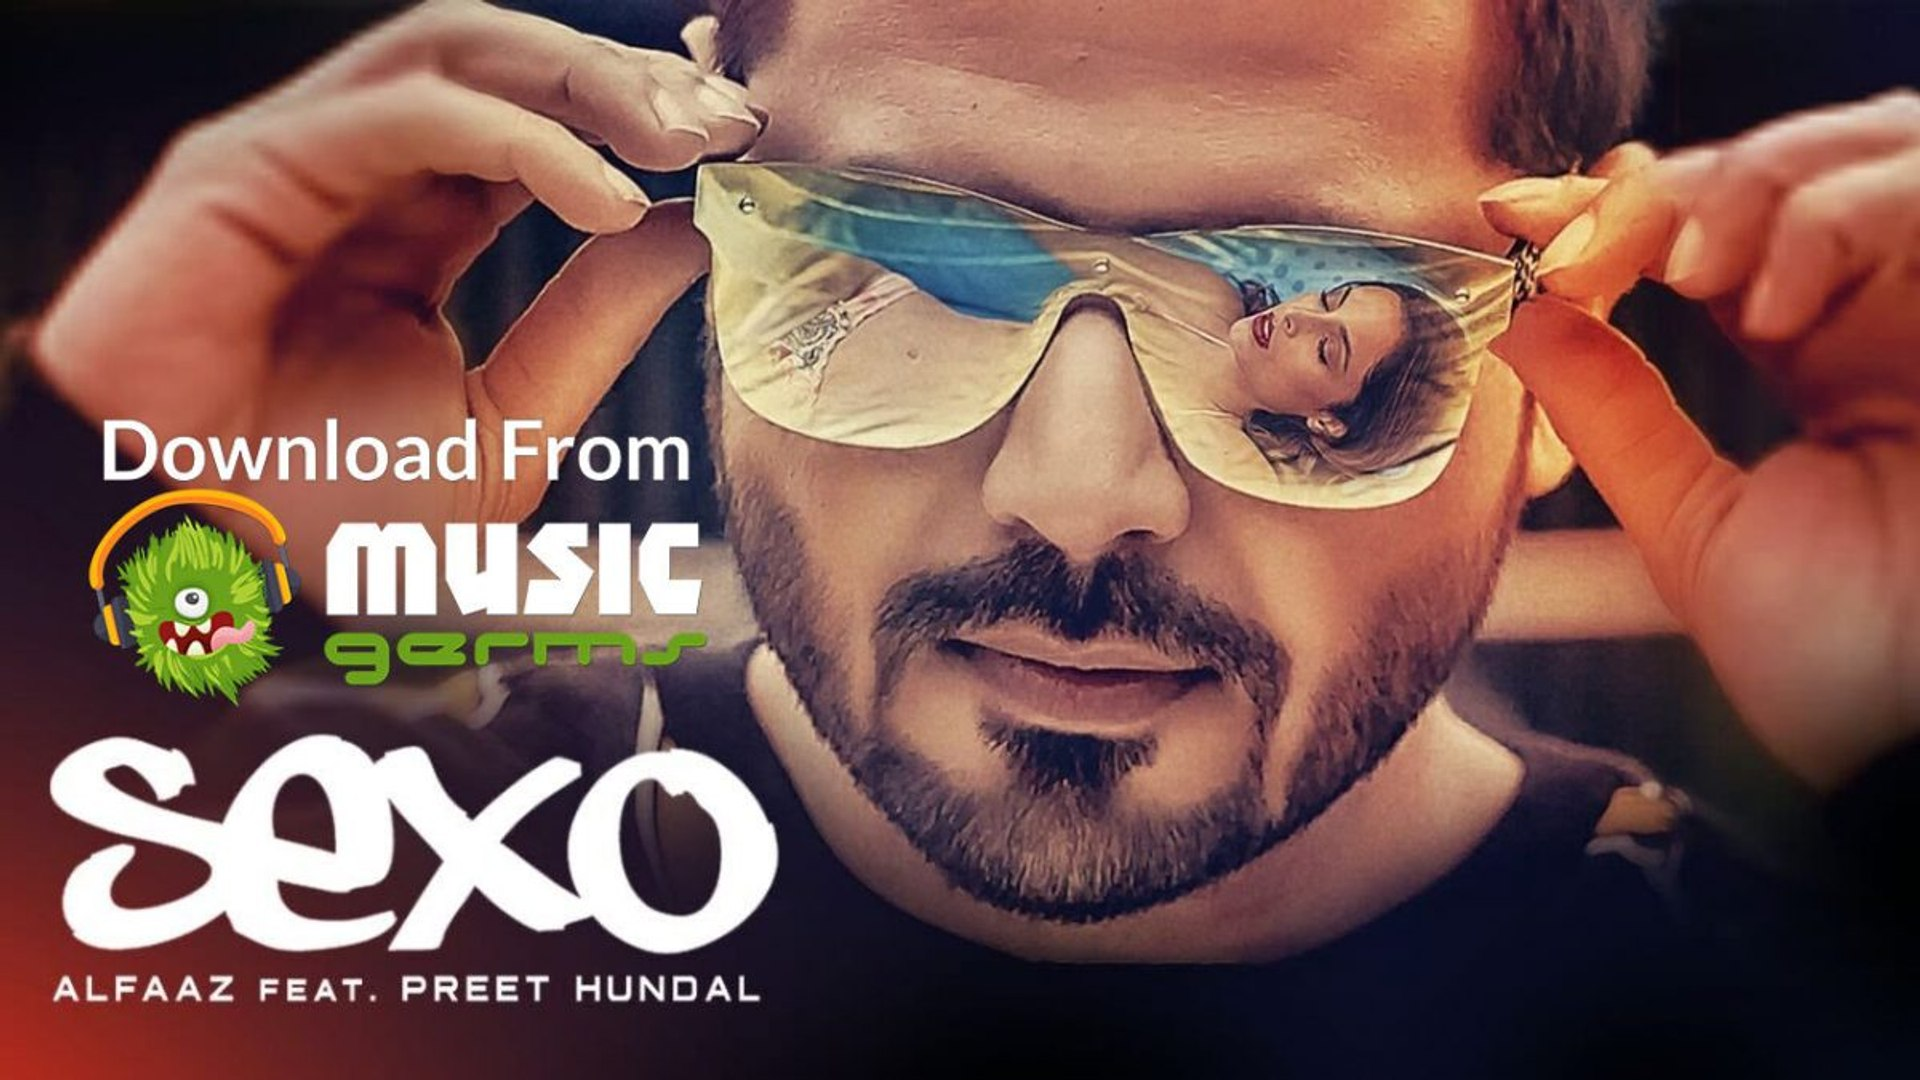 Sexo Video Song | Alfaaz, Preet Hundal | Latest Punjabi Song 2016 | Sound Music